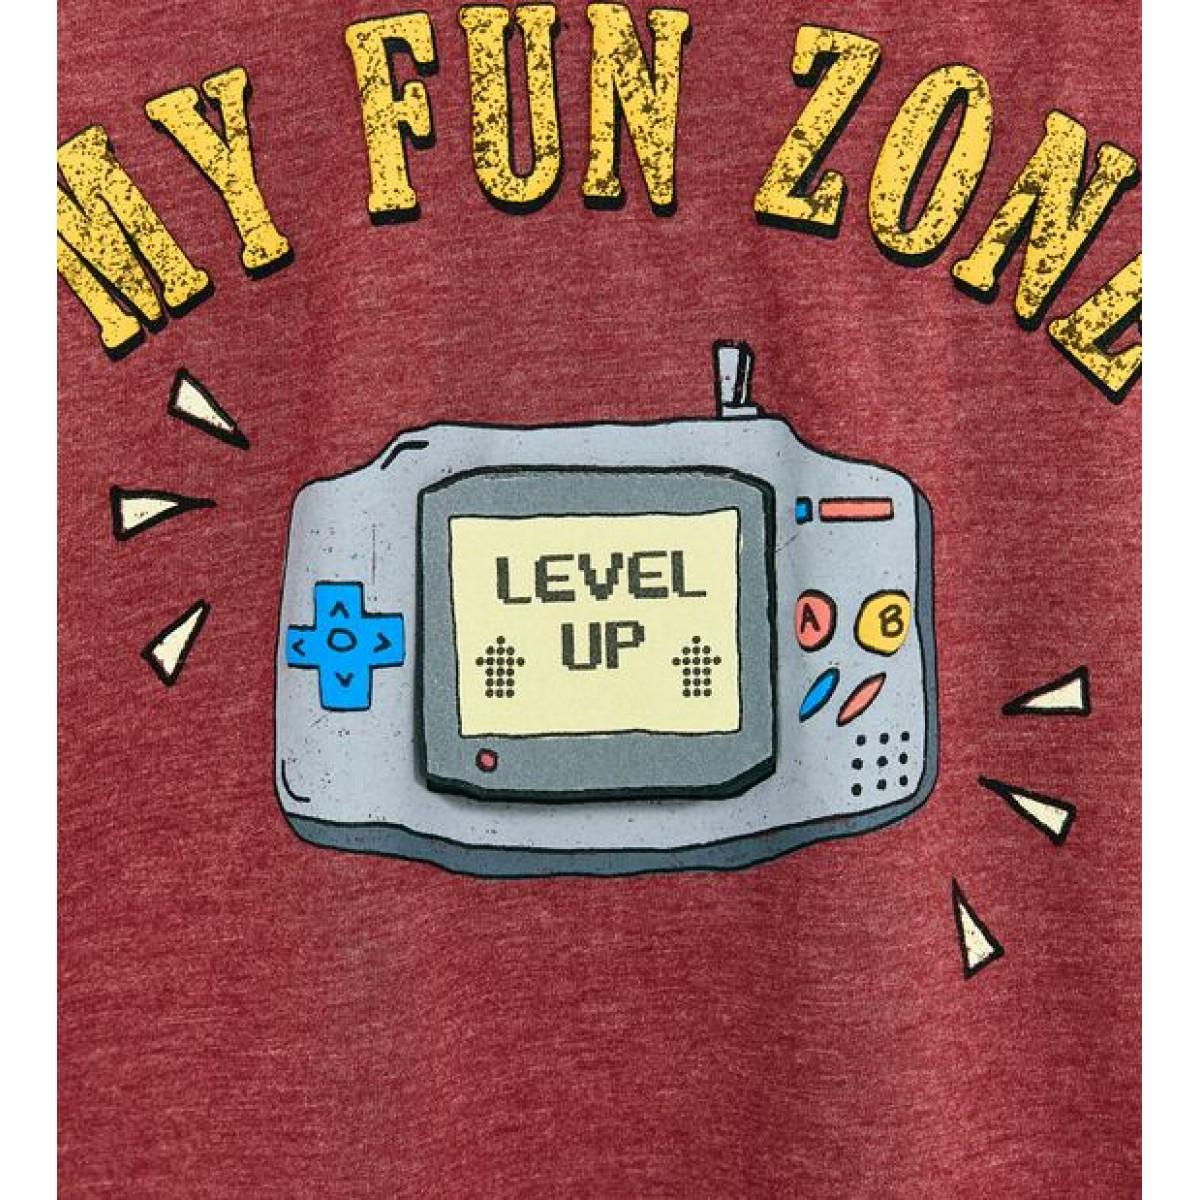 Zara My Fun Zone' T-Shirt